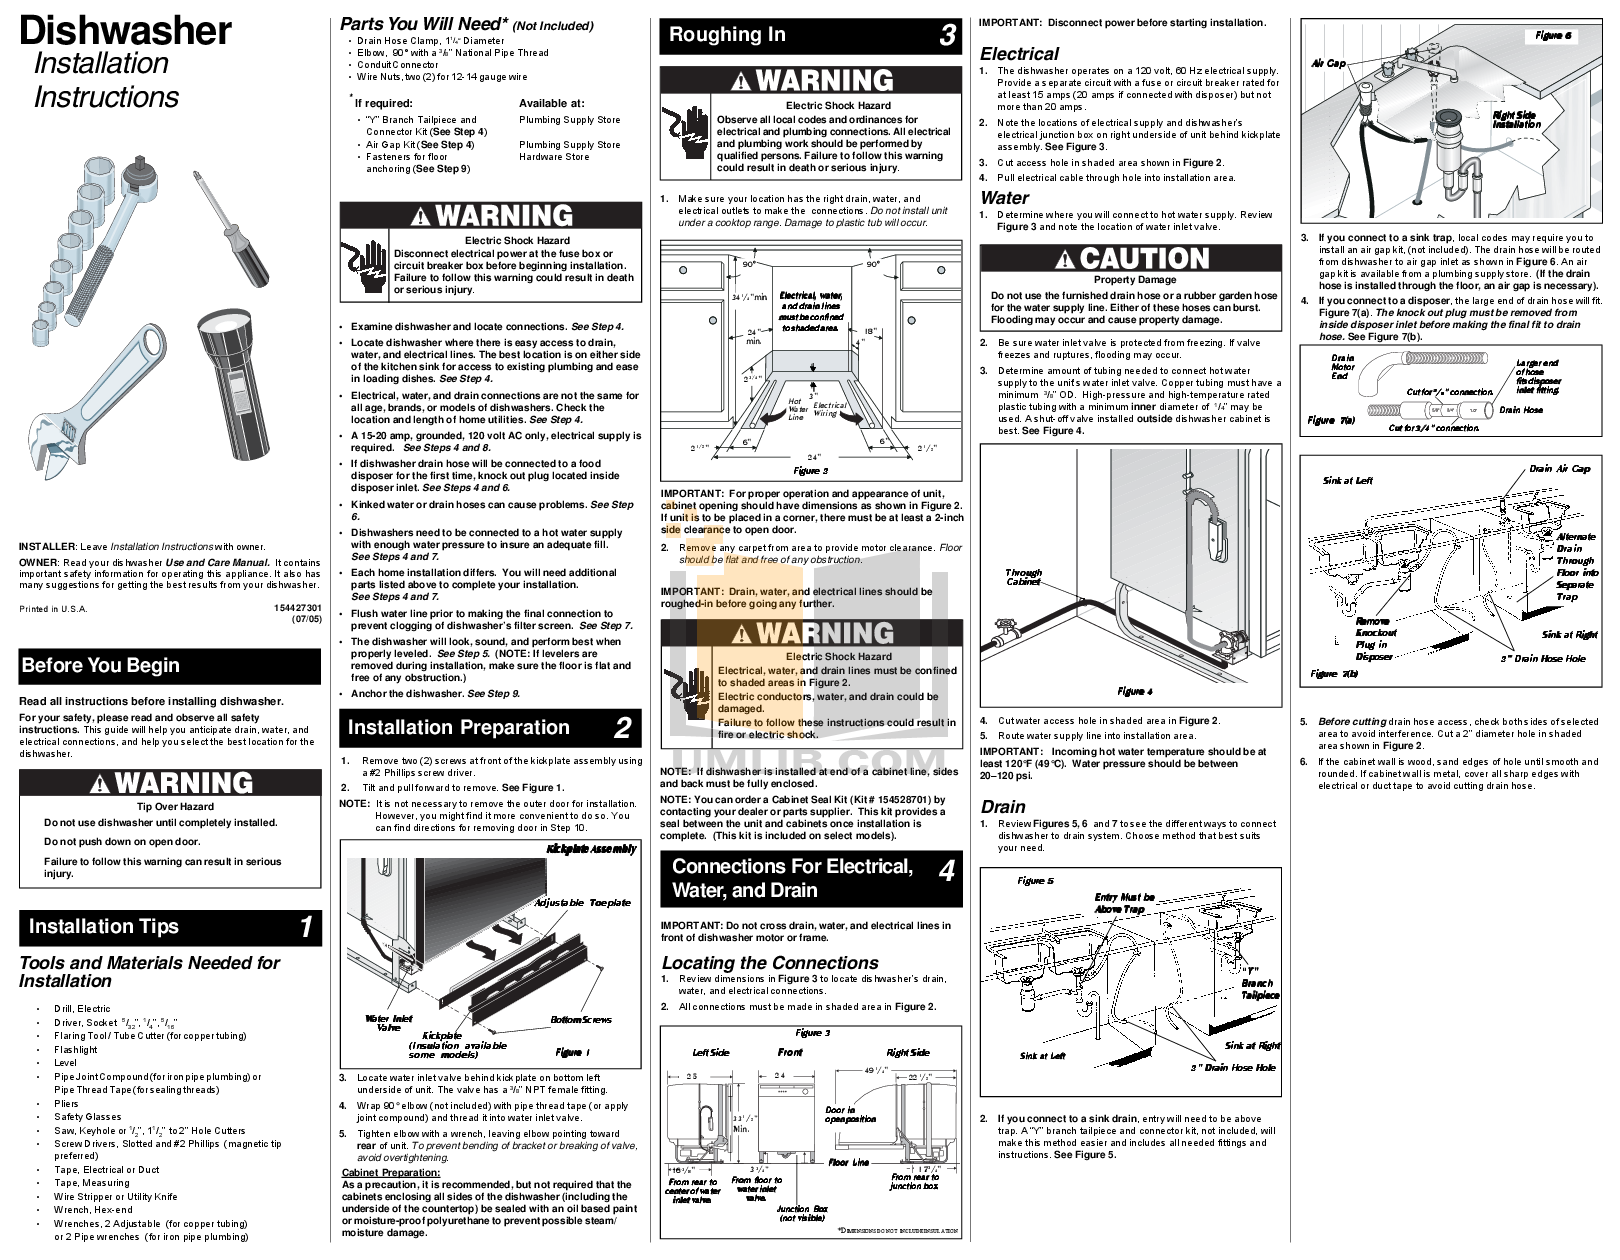 download free pdf for frigidaire fghd2433kf dishwasher manual rh umlib com Frigidaire Dishwasher Model Numbers Frigidaire Dishwasher Model Numbers